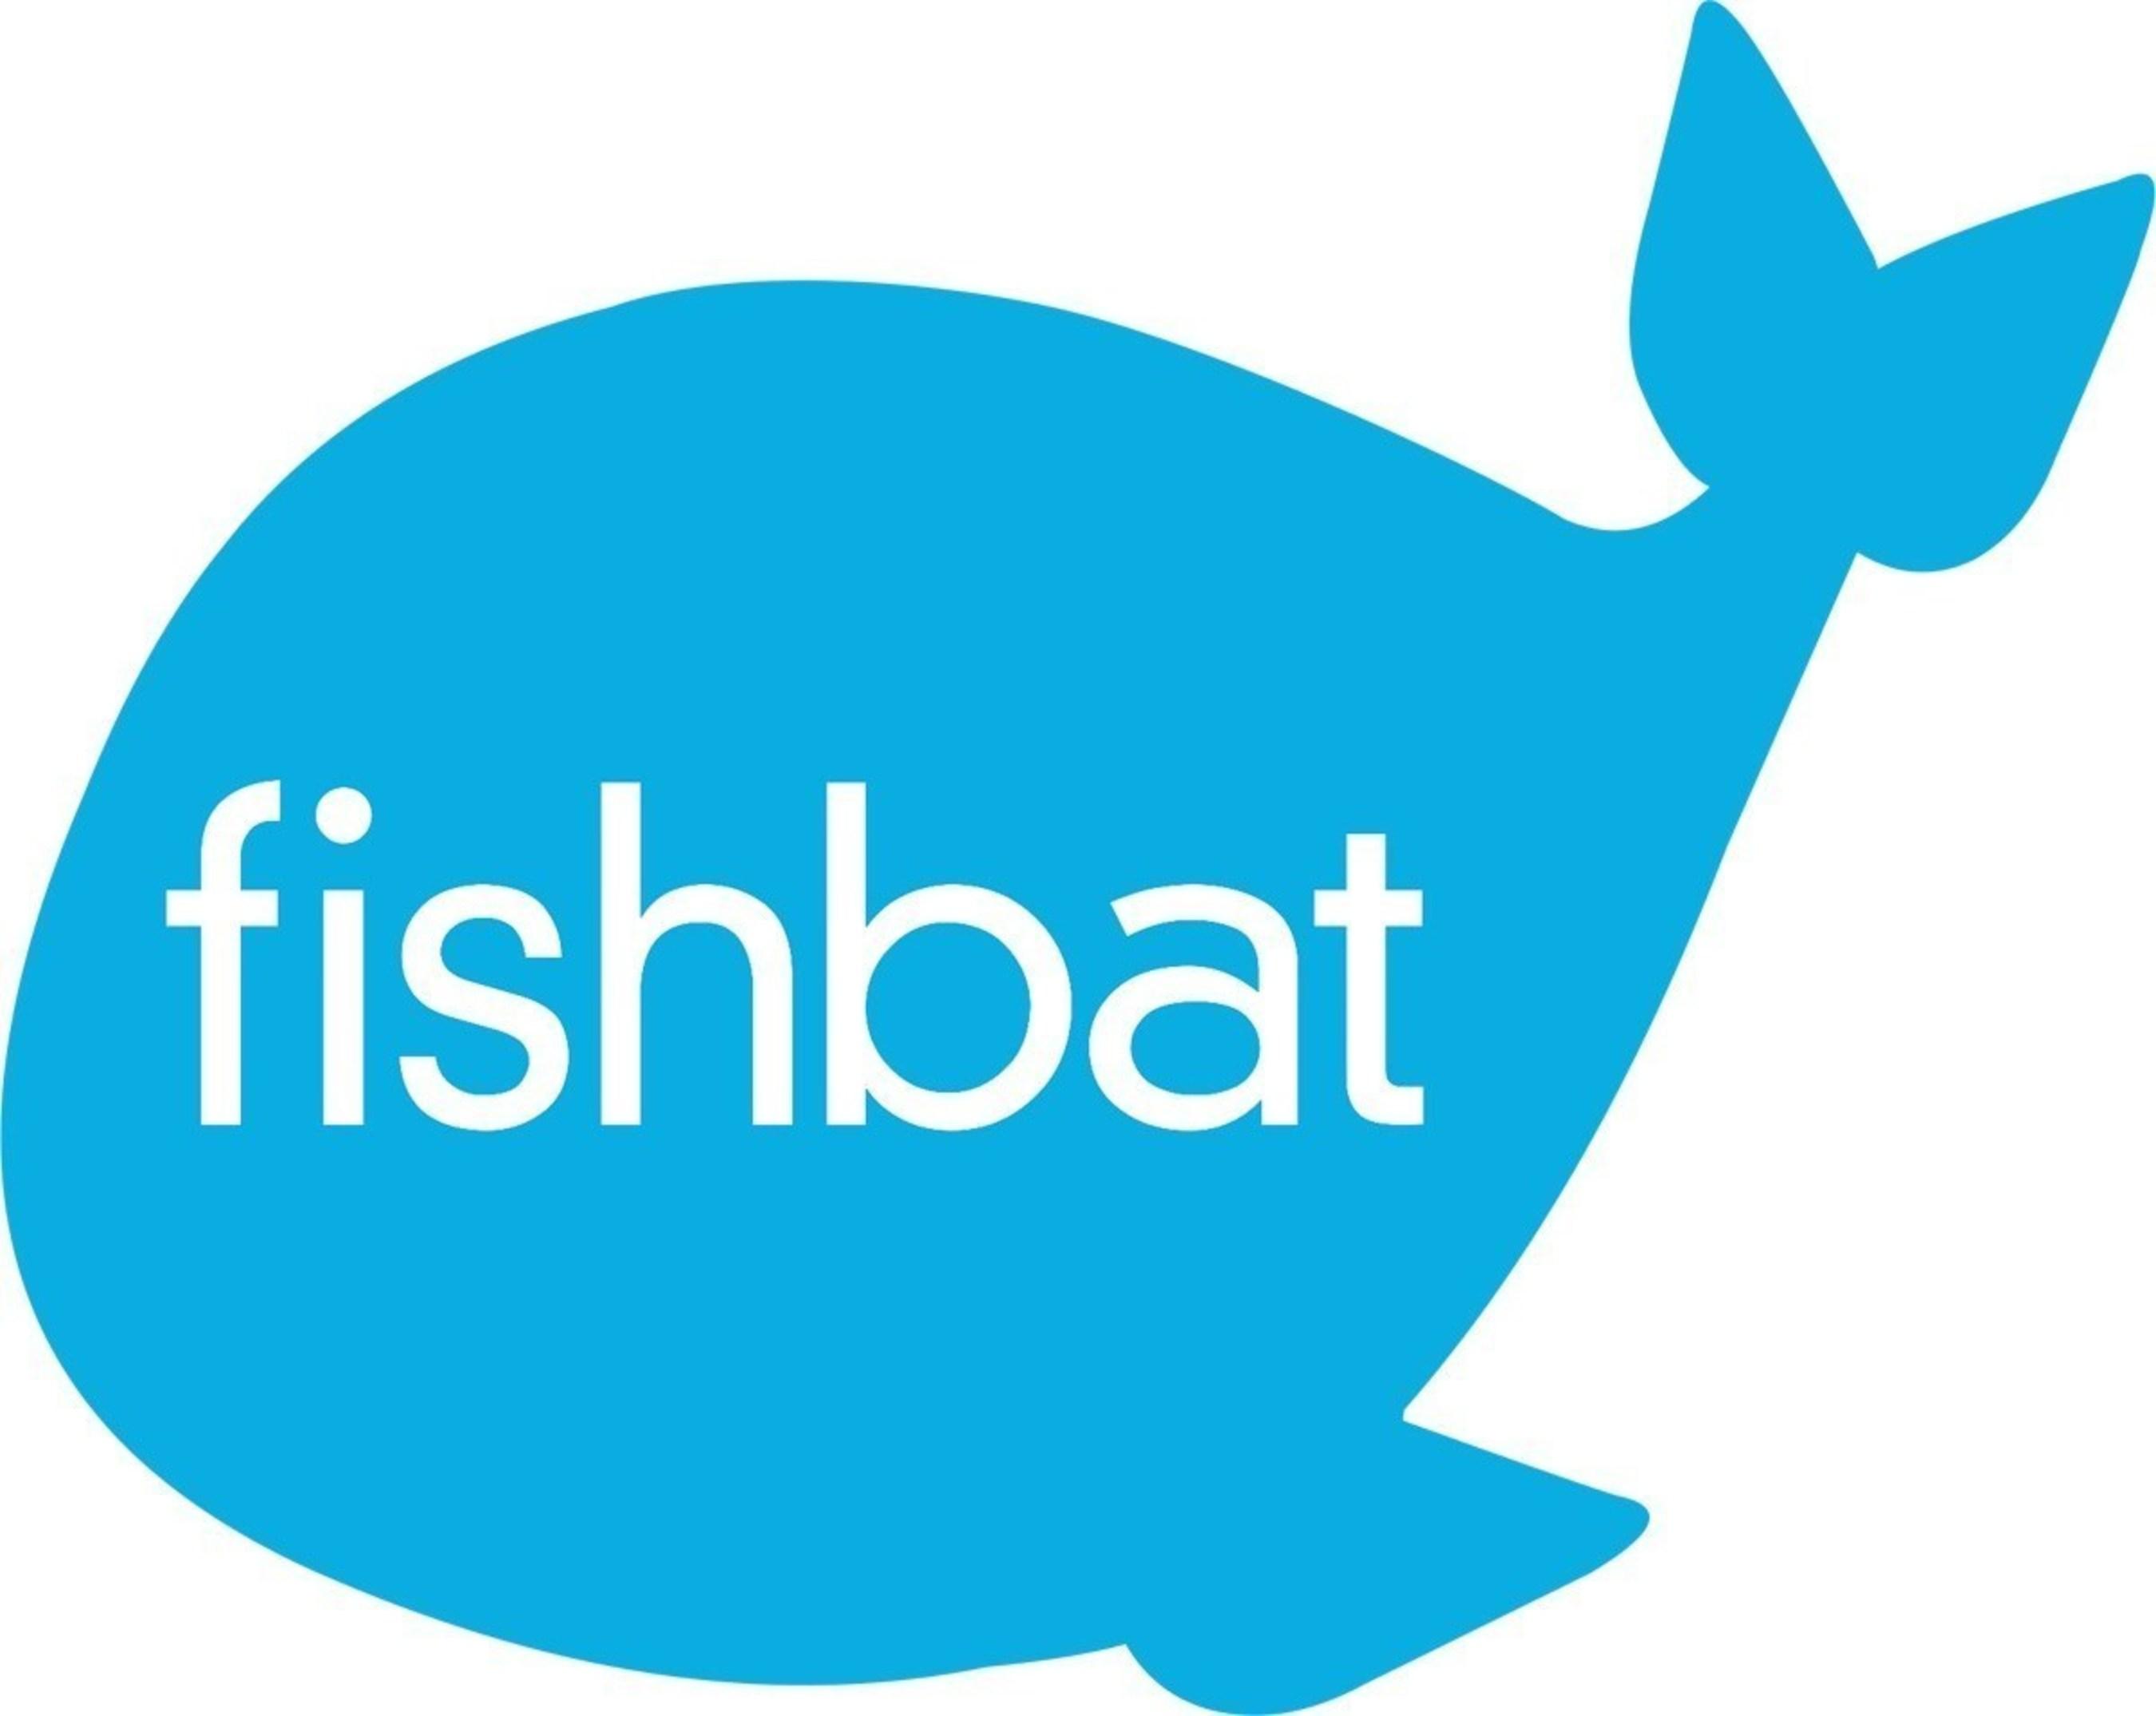 fishbat CEO Clay Darrohn Discusses Social Media's Impact on the 2016 Presidential Election